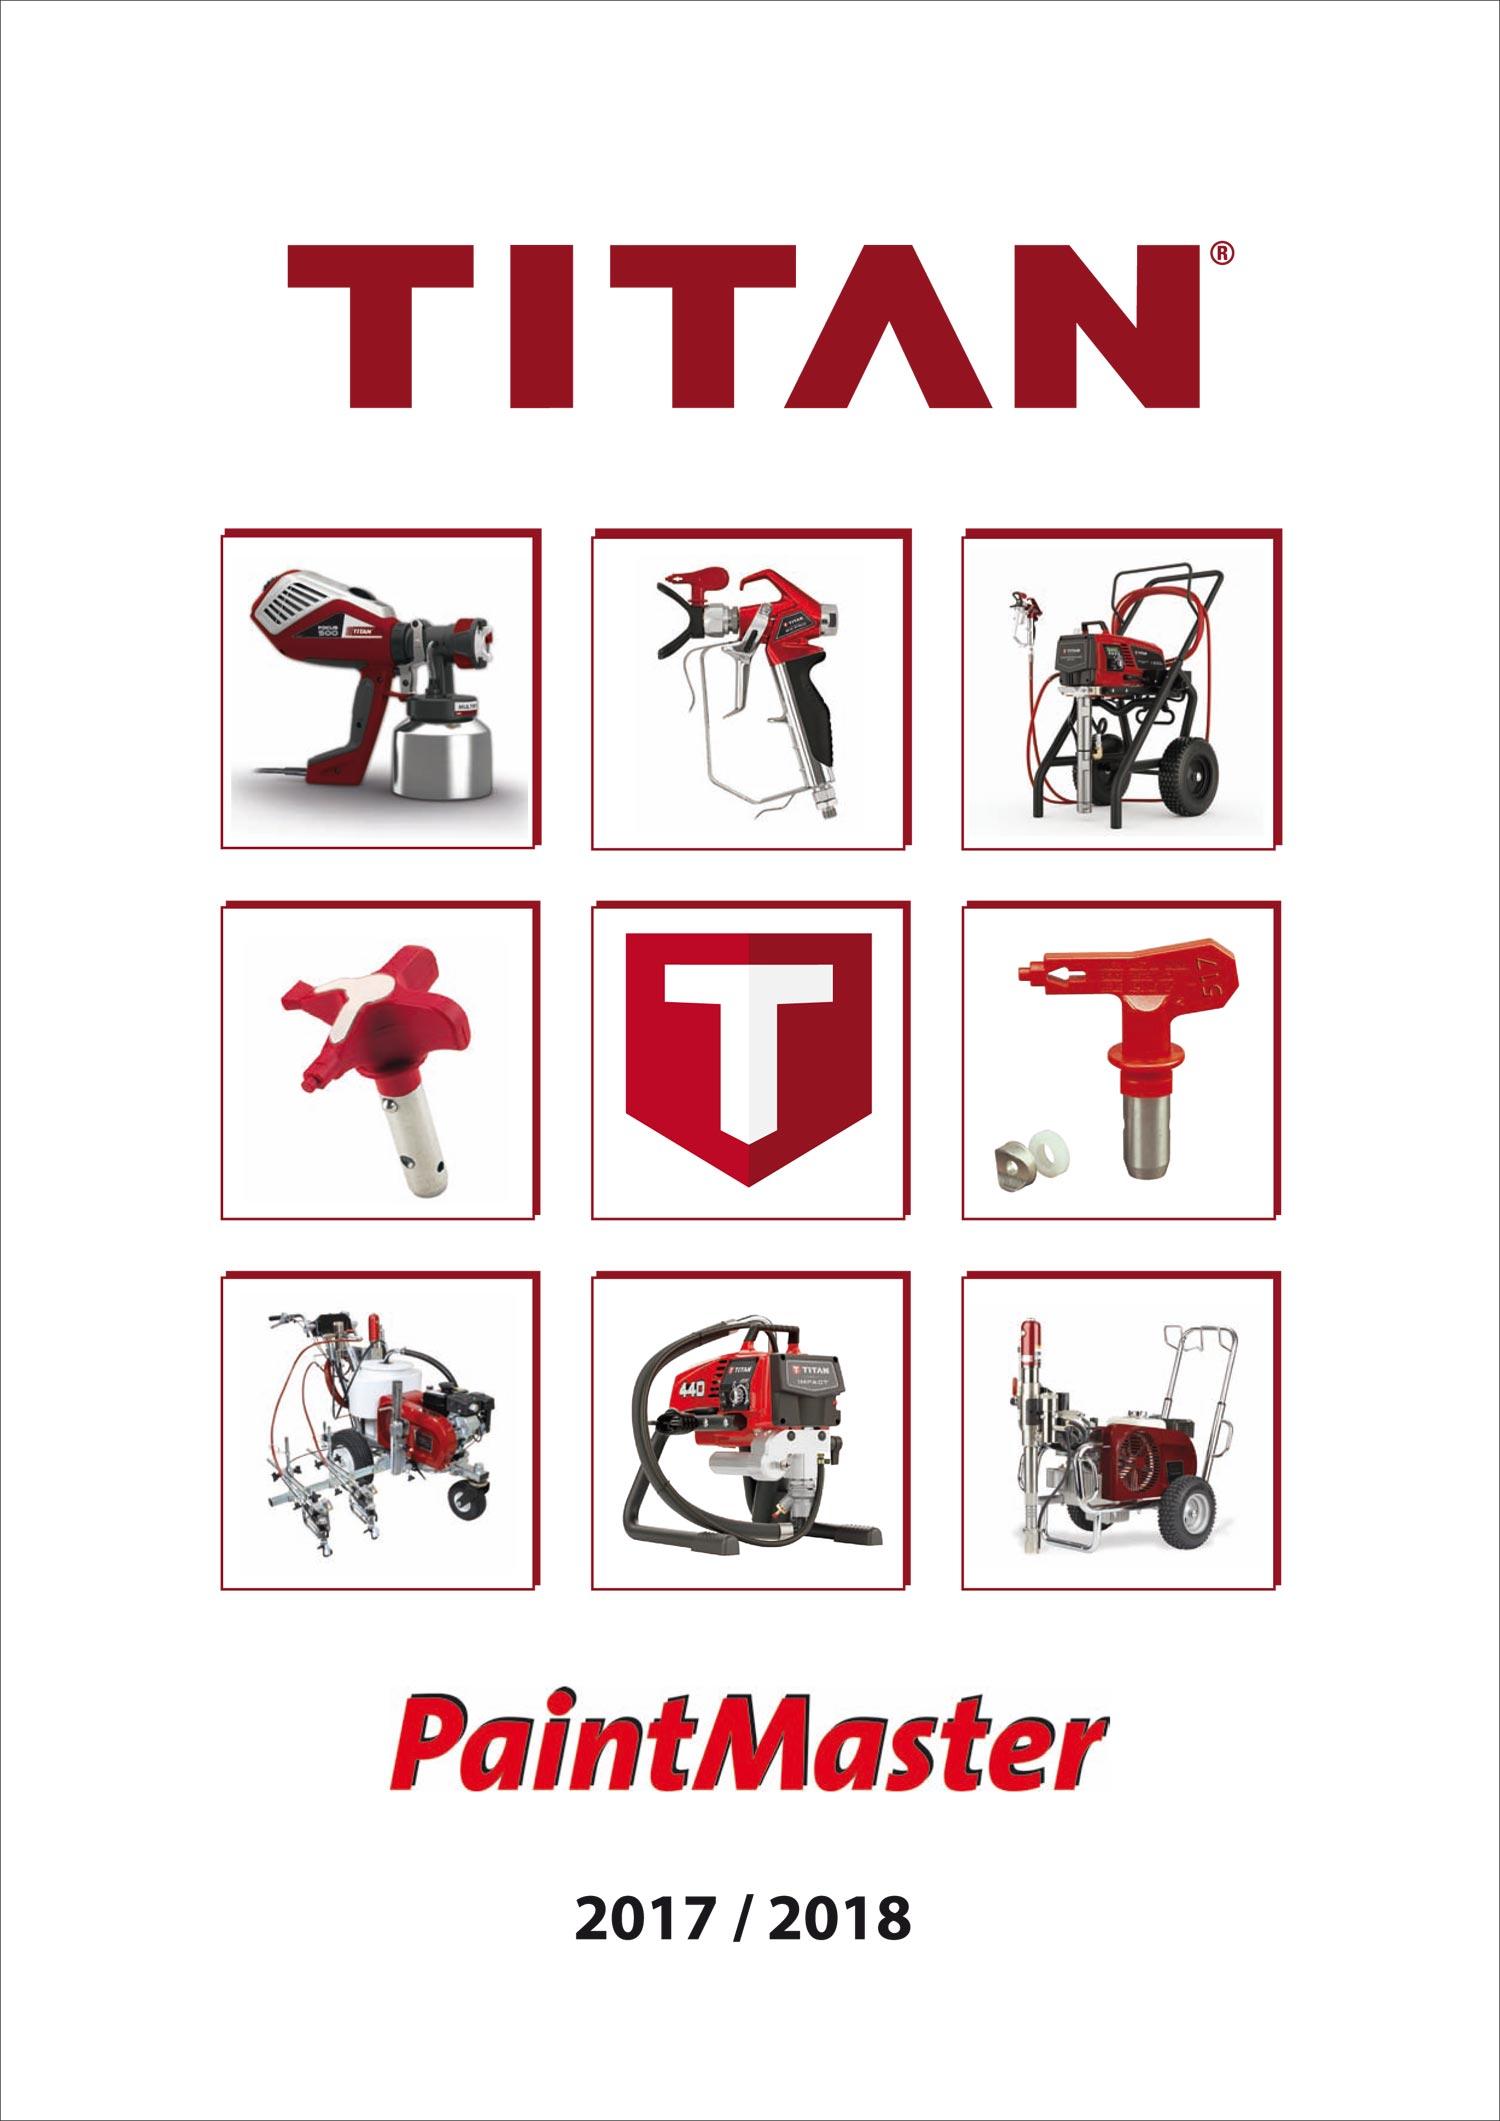 Linz Titan Spritztechnik Produktkataloge 2017